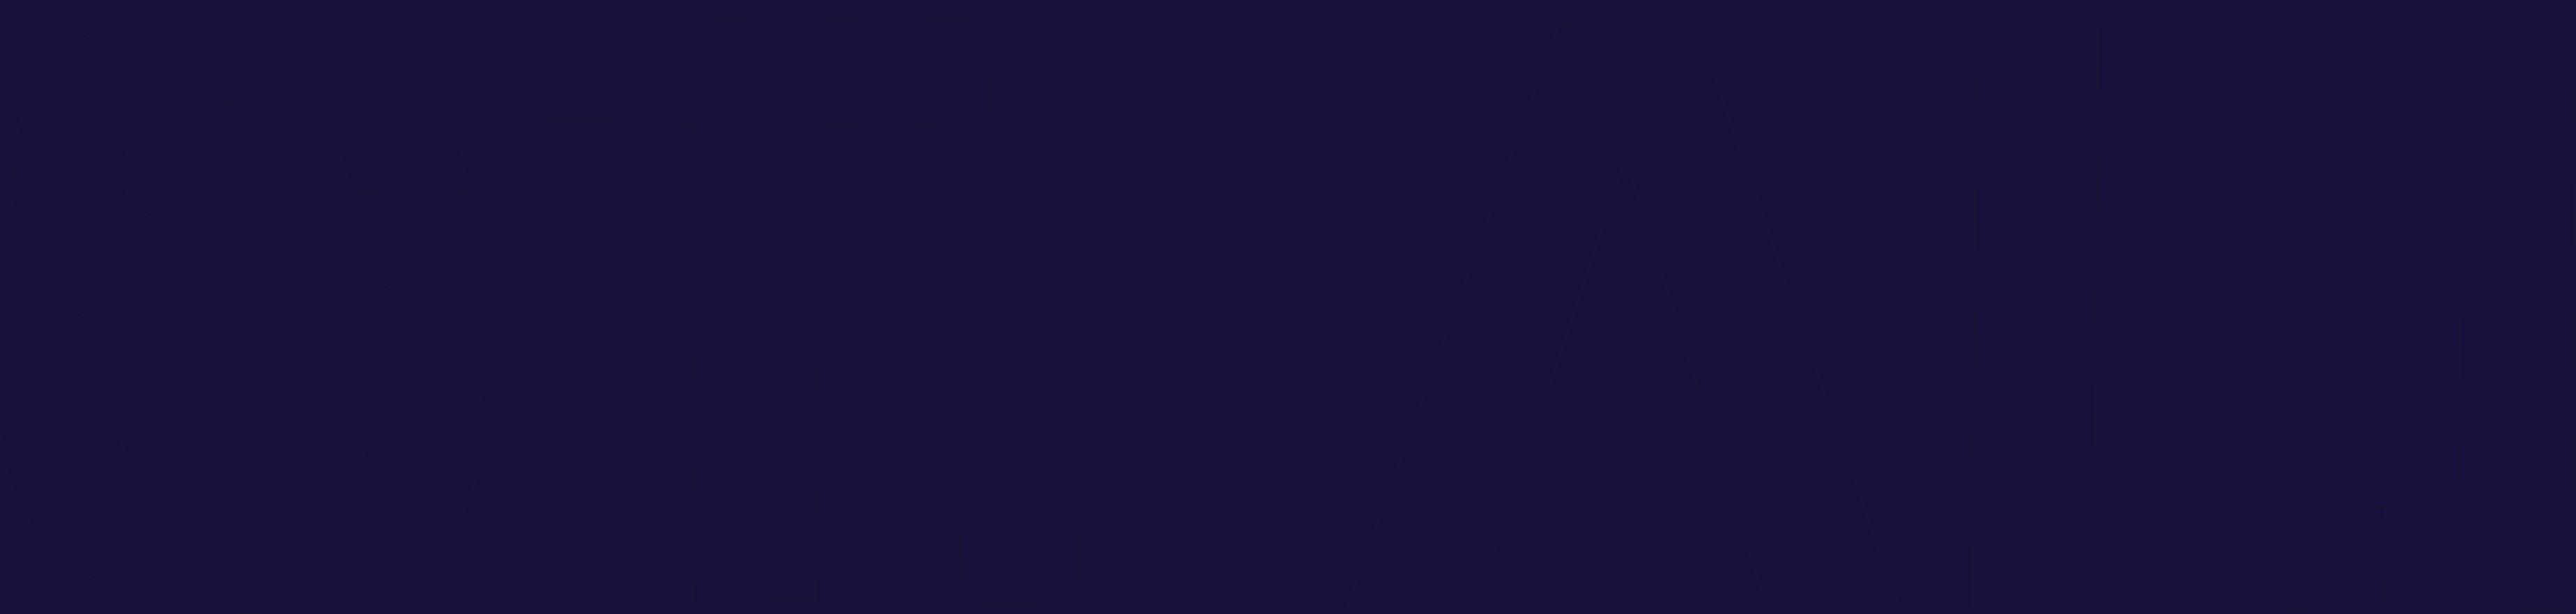 Saint Ali logo